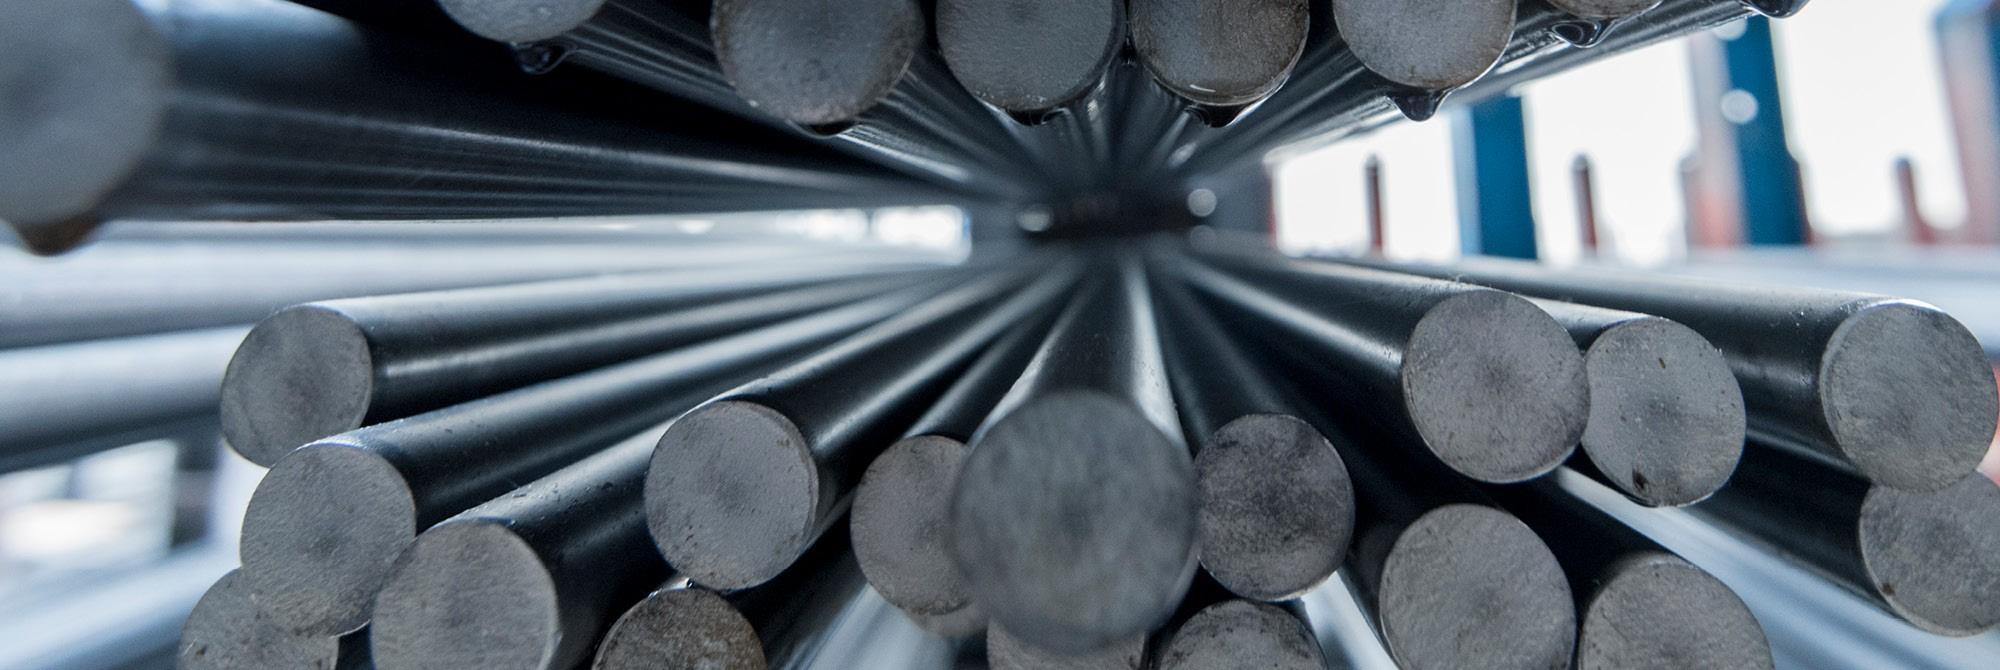 High-speed steels -Tools bits